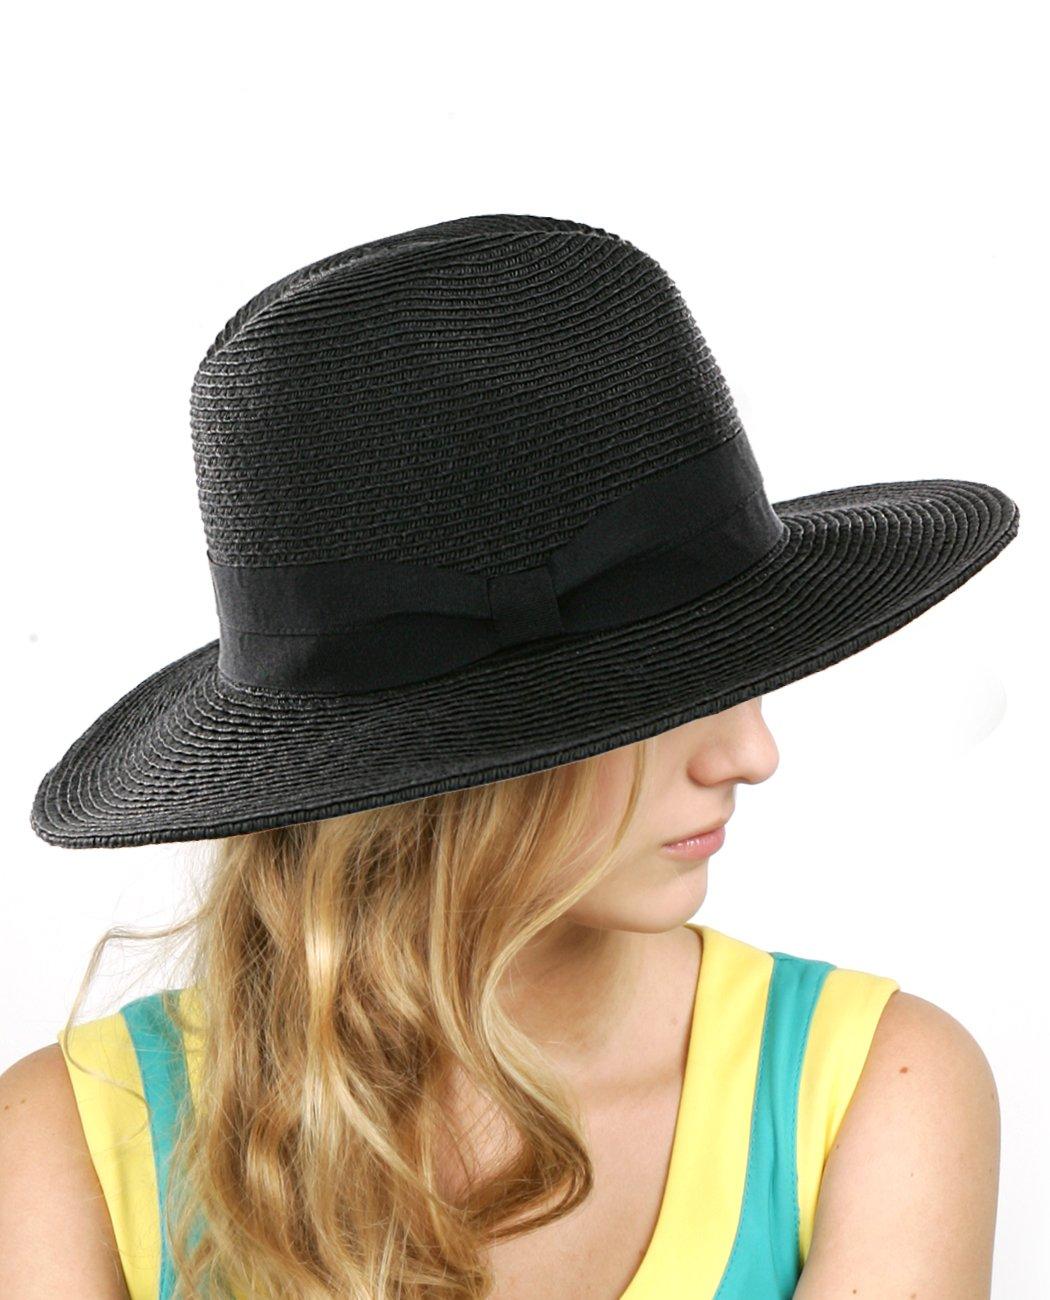 NYFASHION101 Lightweight Solid Color Panama Fedora Sun Hat, Black